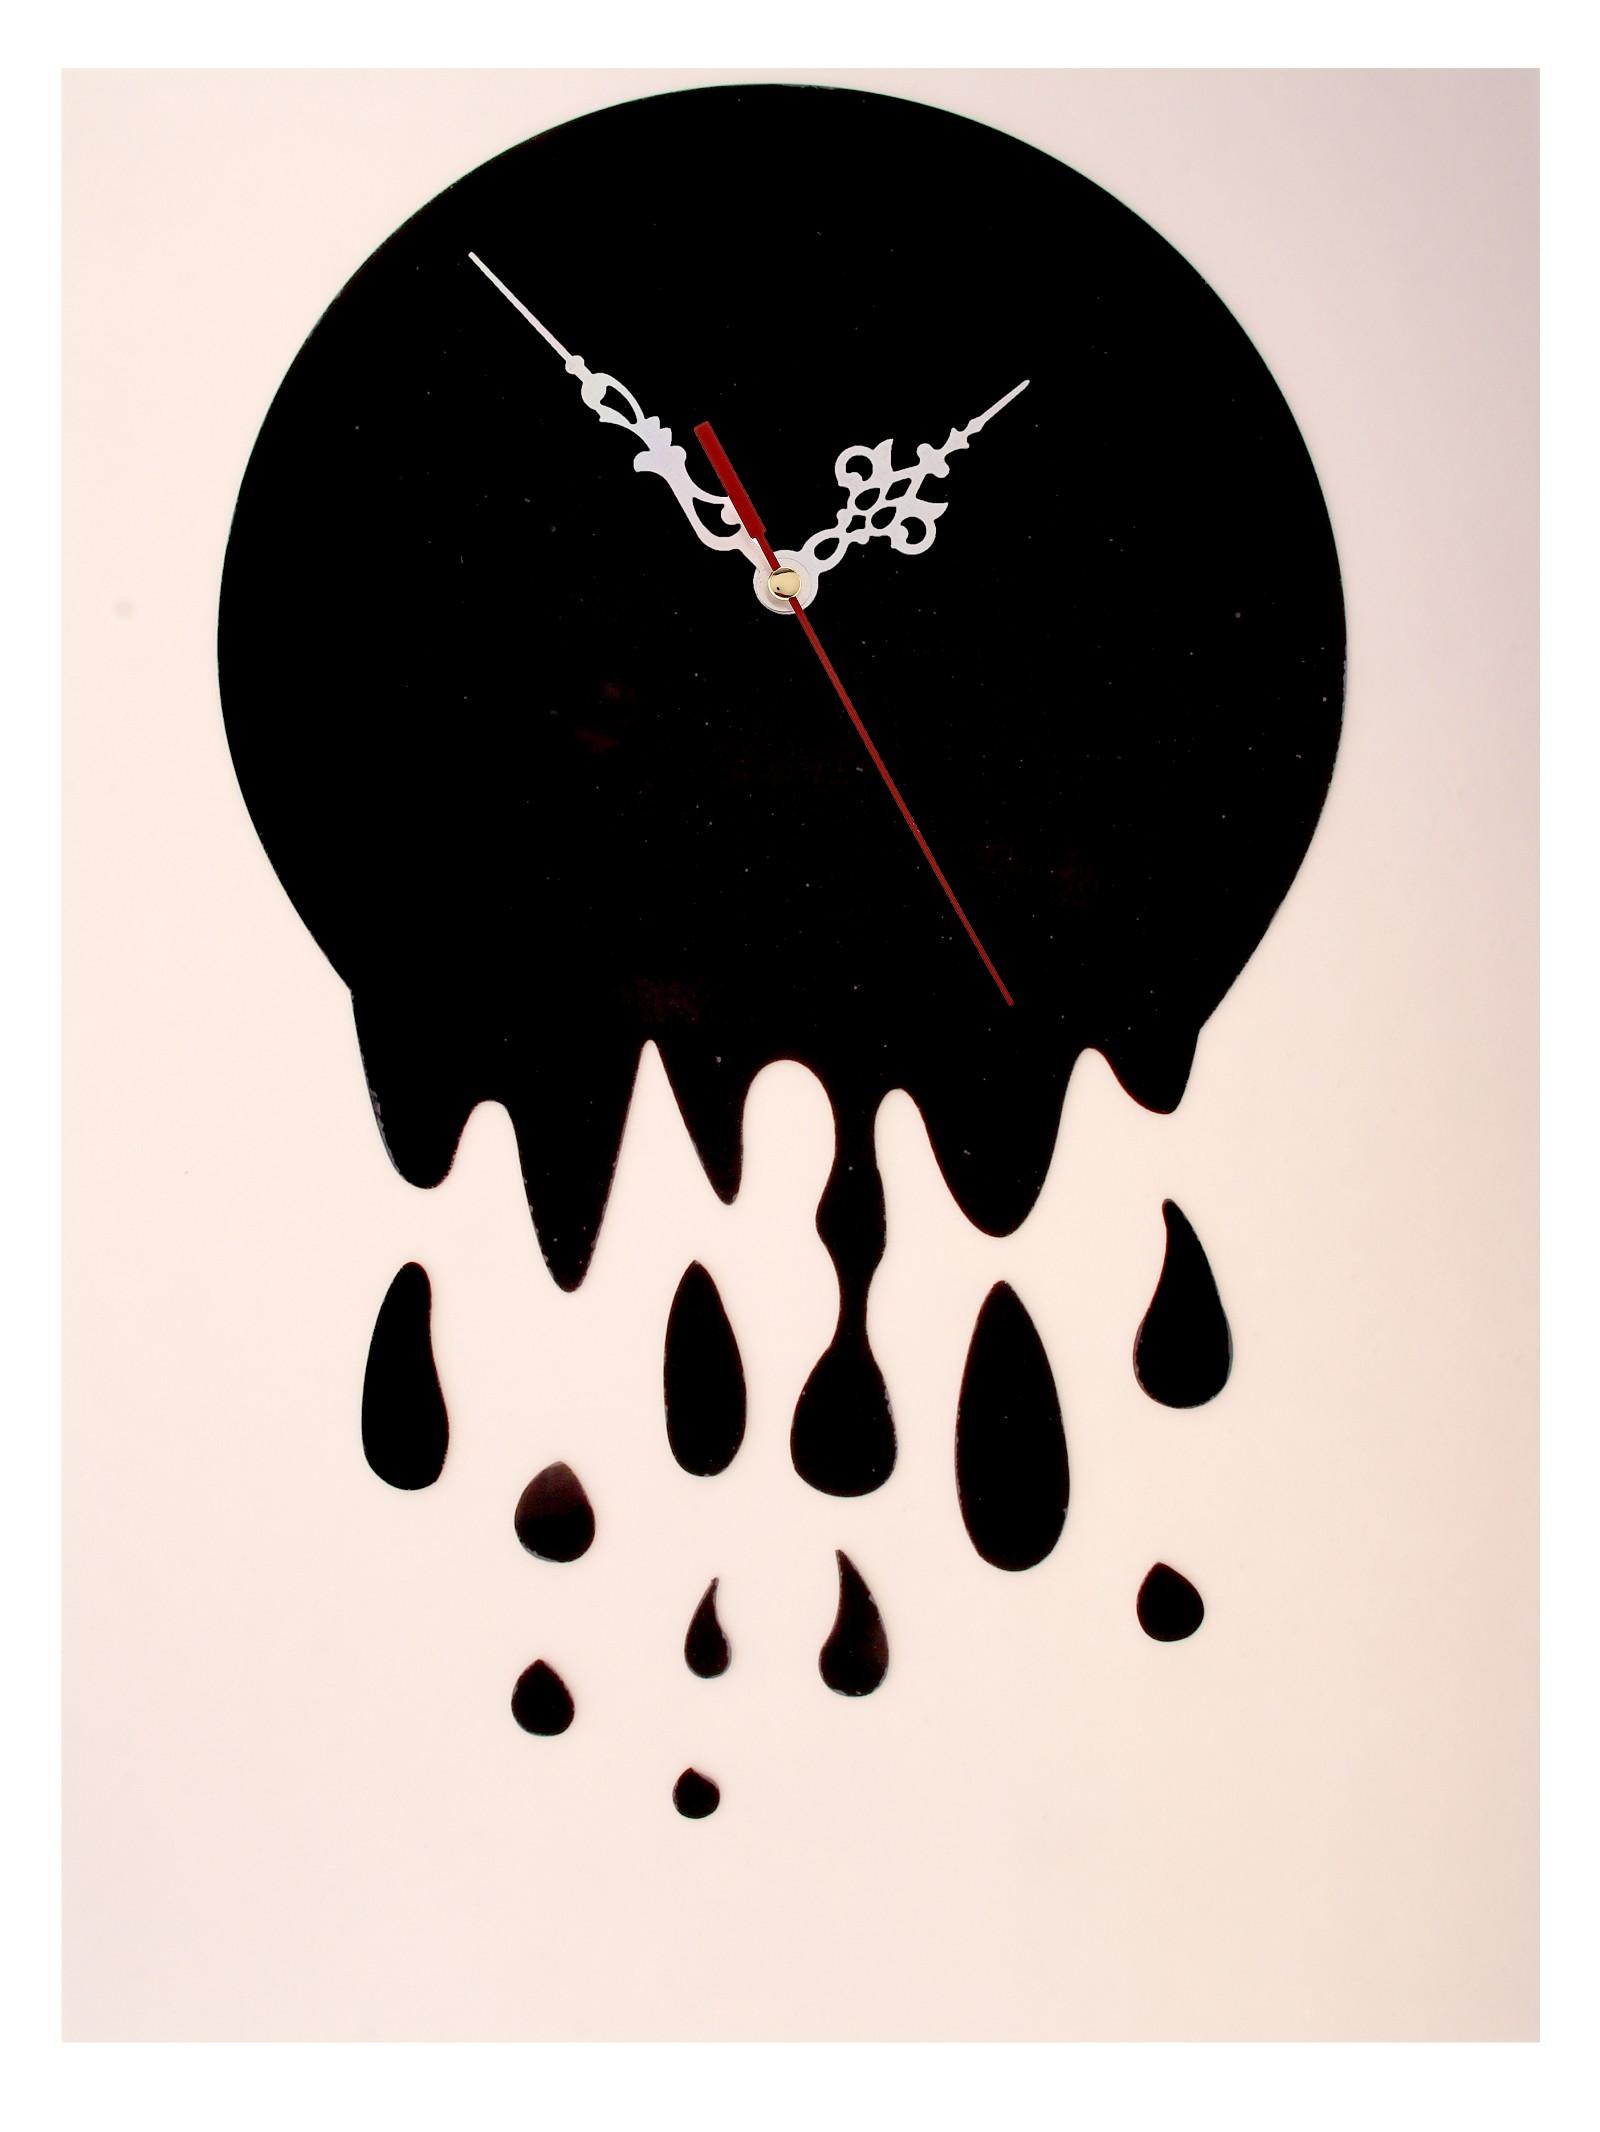 Часы-наклейка Капли, 60 см х 44 см. 729548